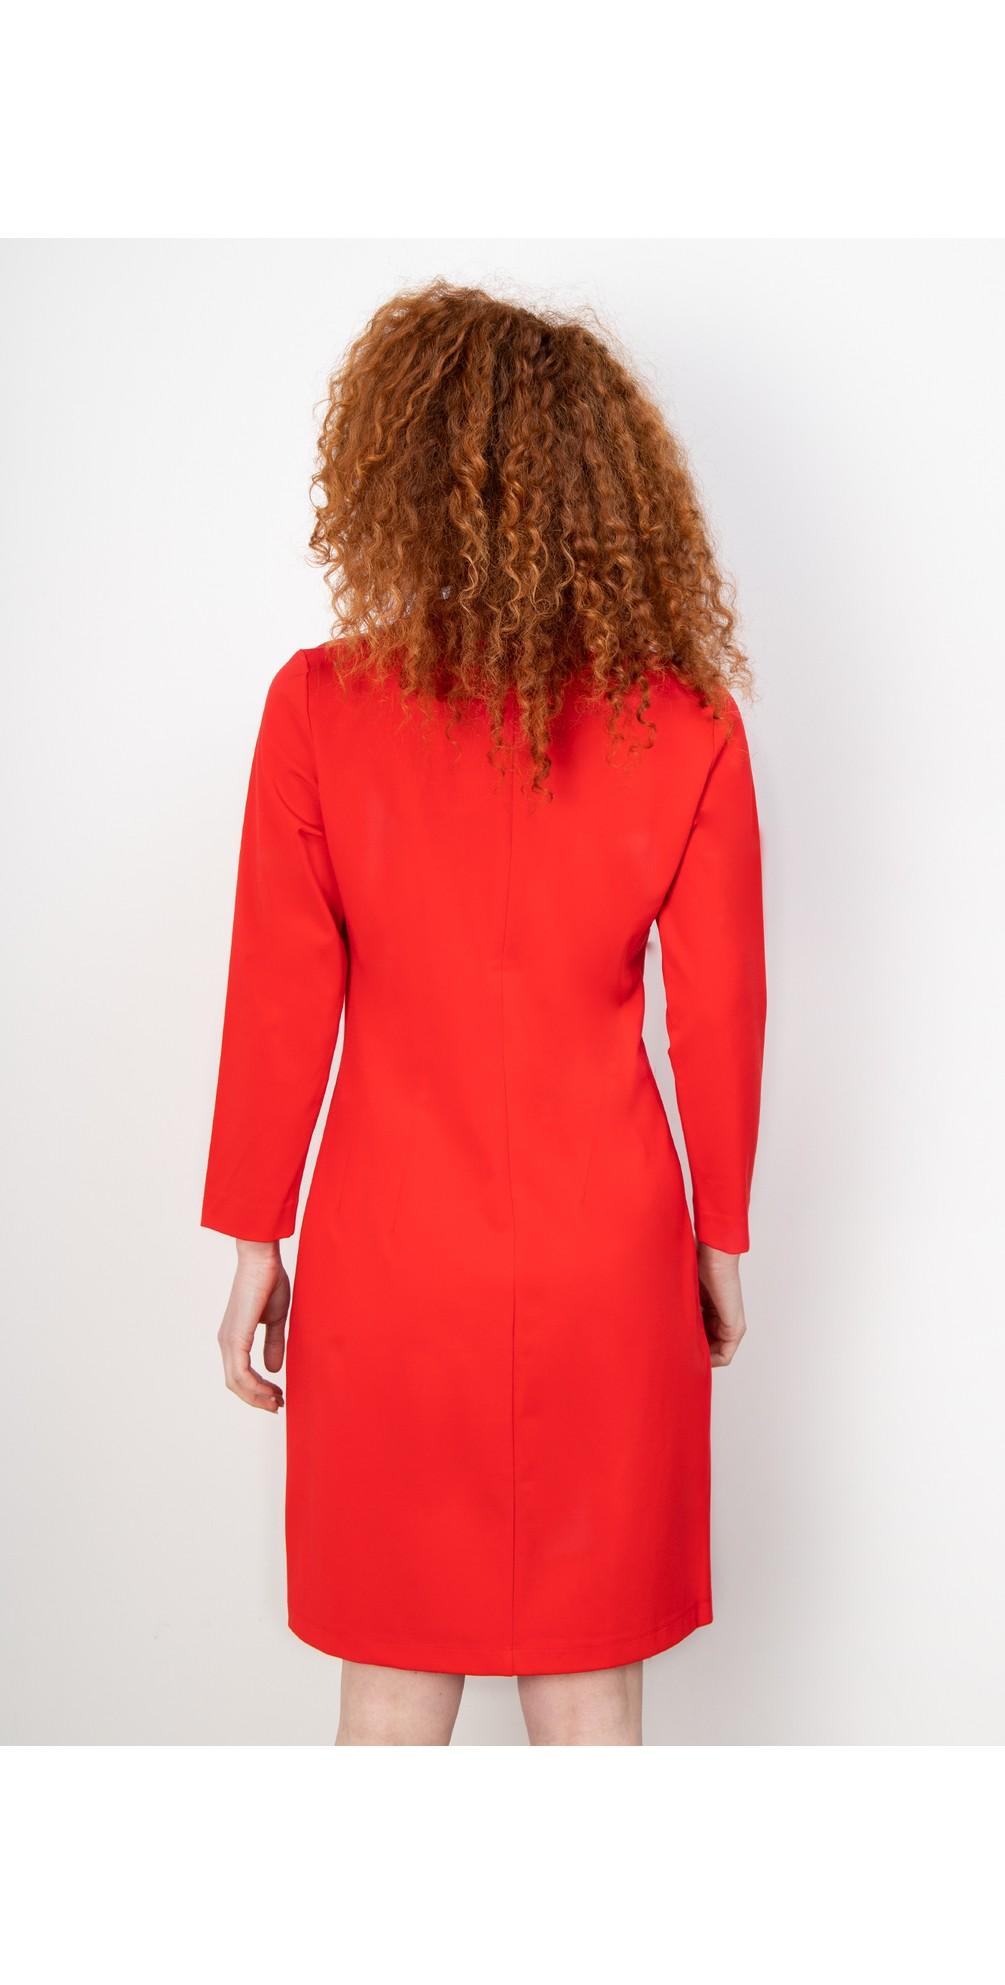 Fitted V-Neck Dress main image